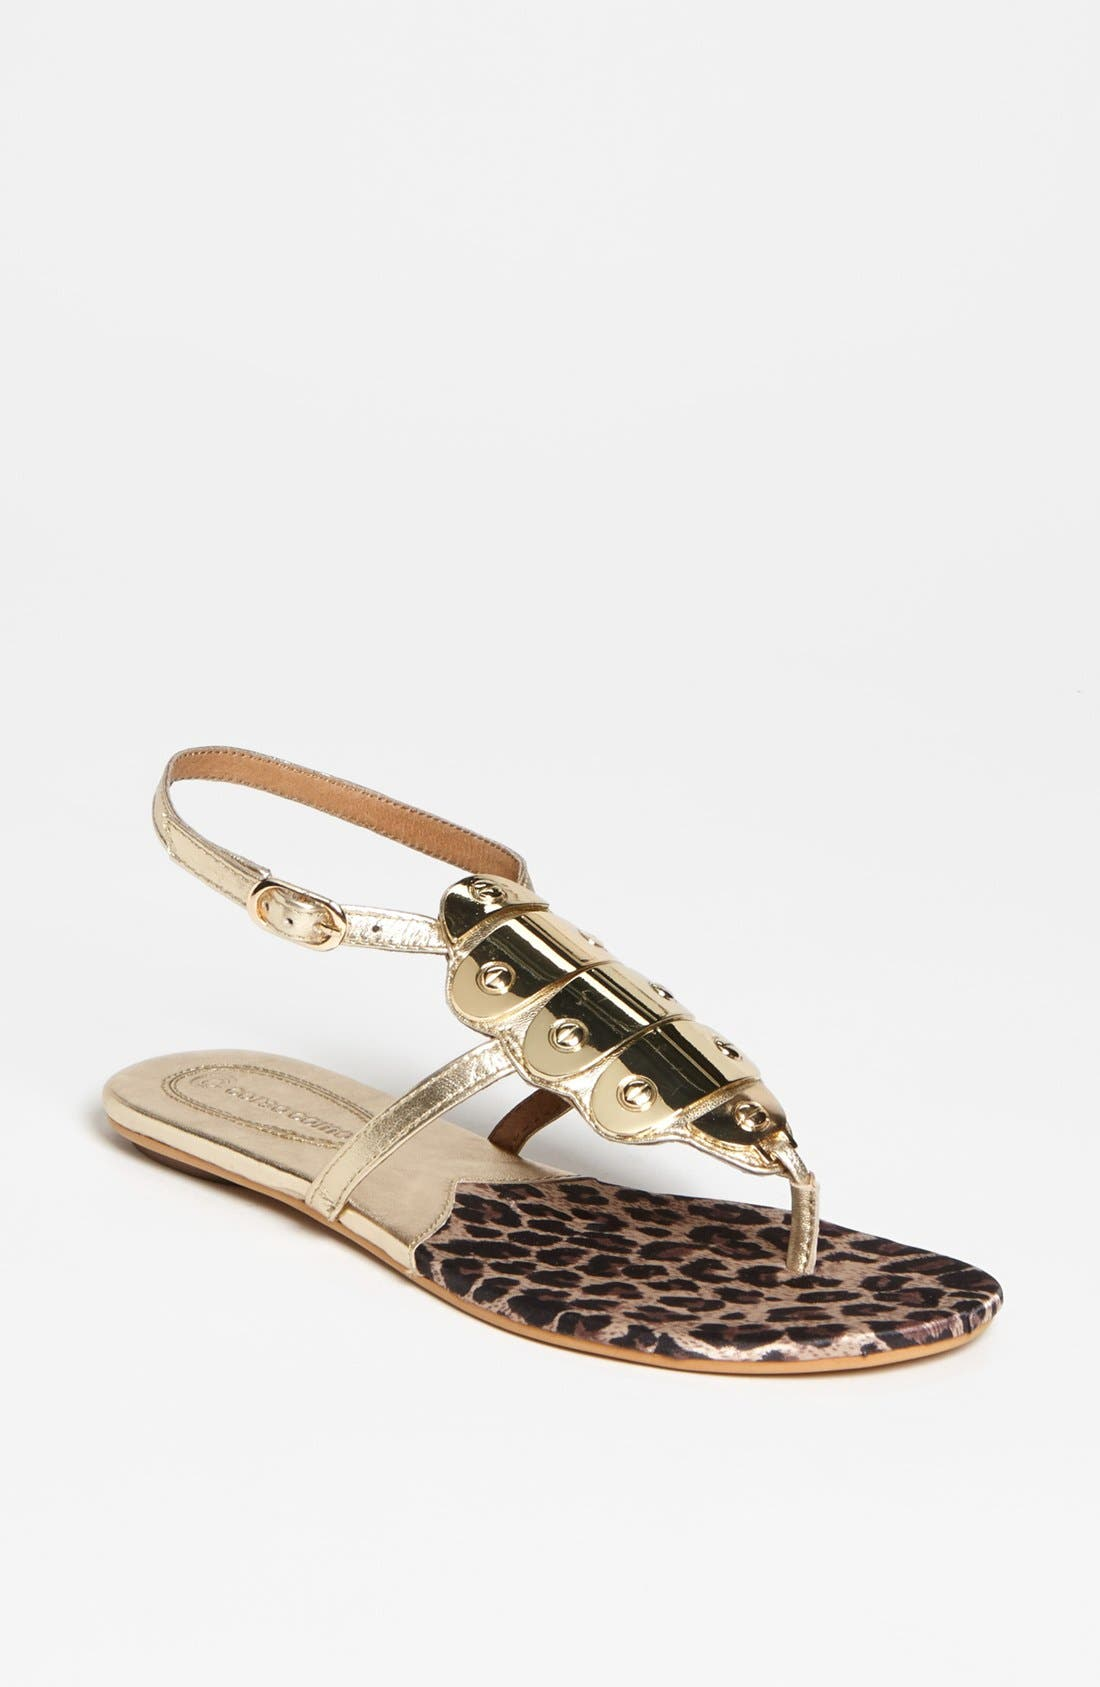 Alternate Image 1 Selected - Corso Como 'Delfim' Sandal